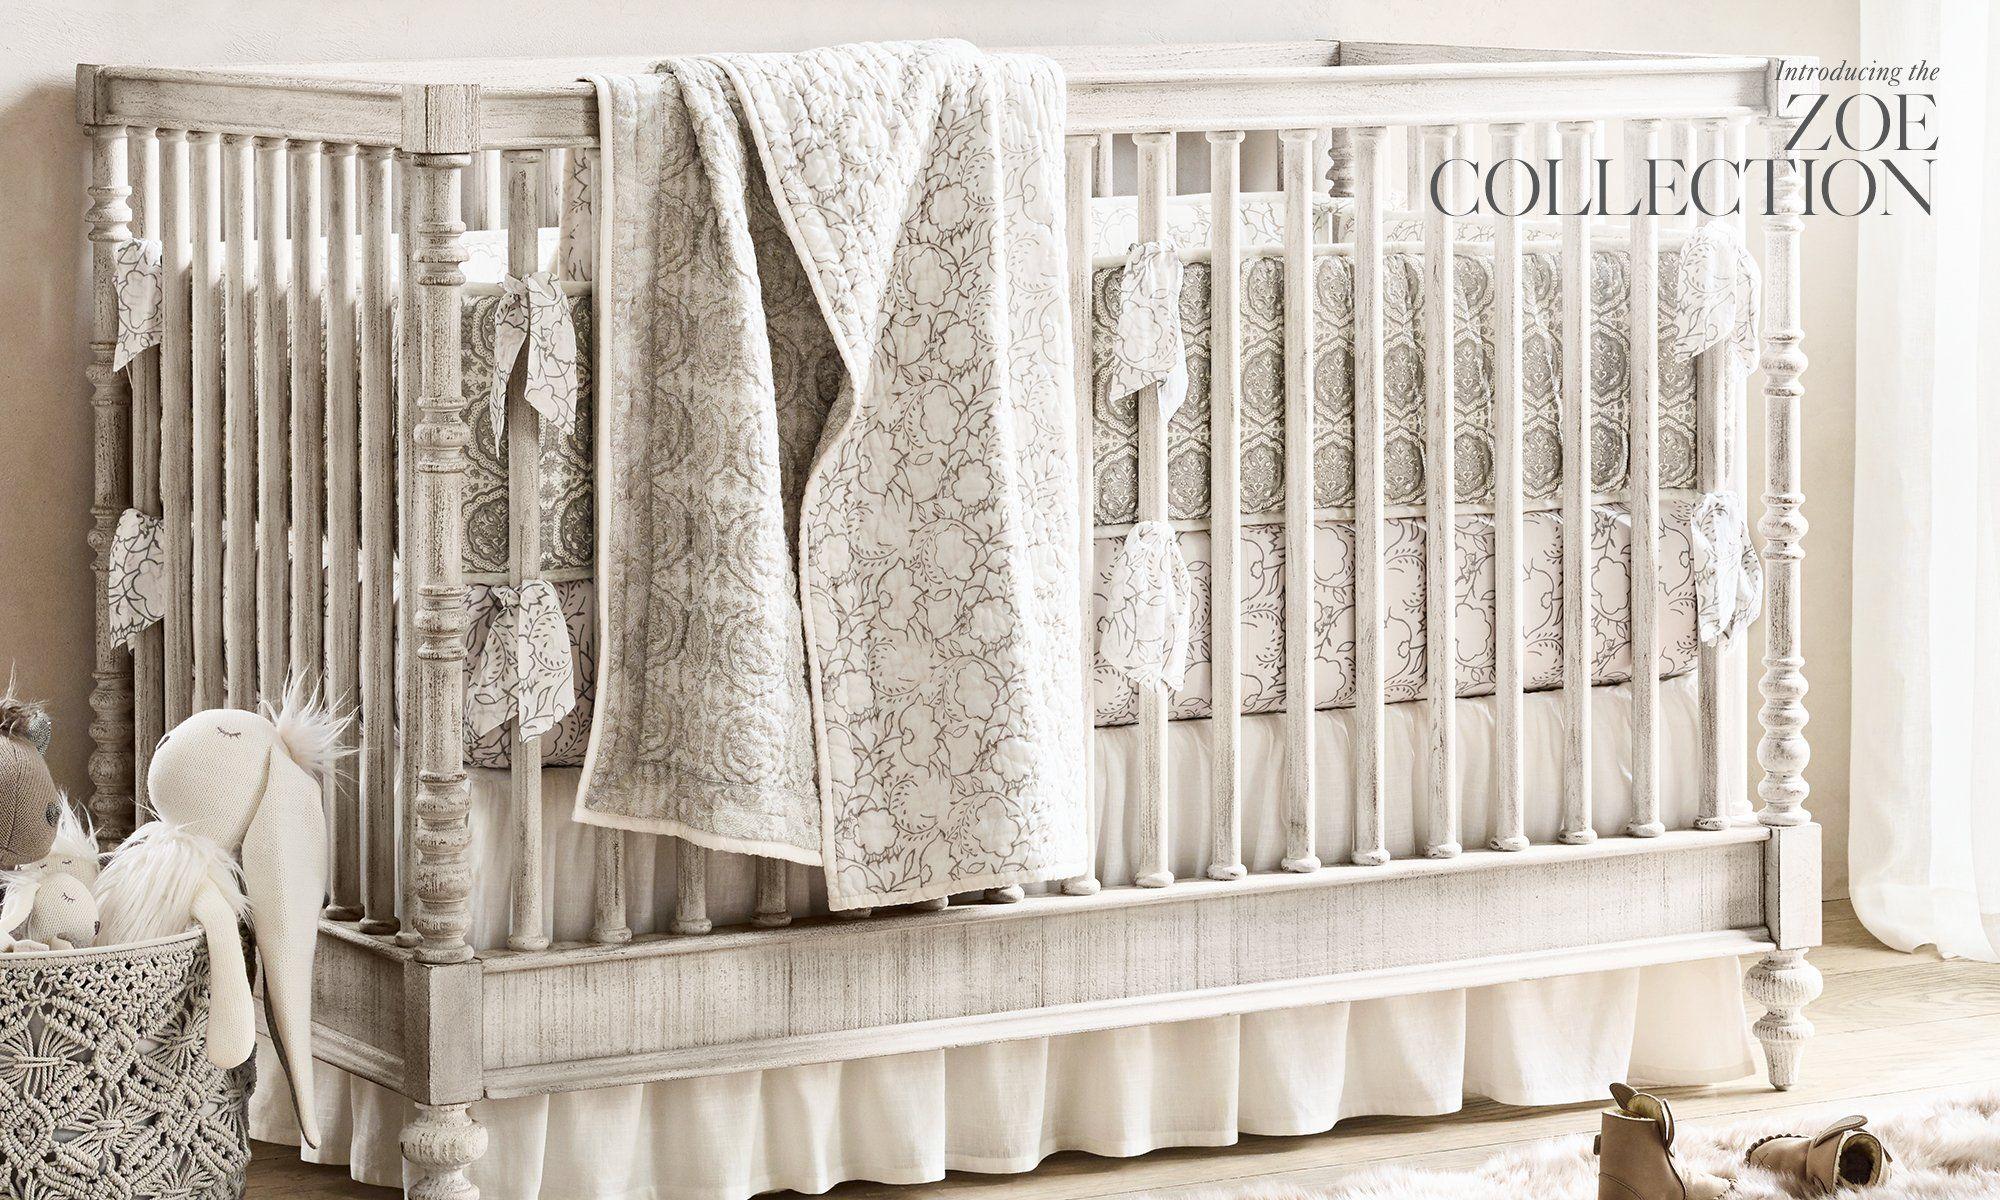 Rh Baby Child Homepage Furniture Luxury And Children S Furnishings Crib Bedding Nursery